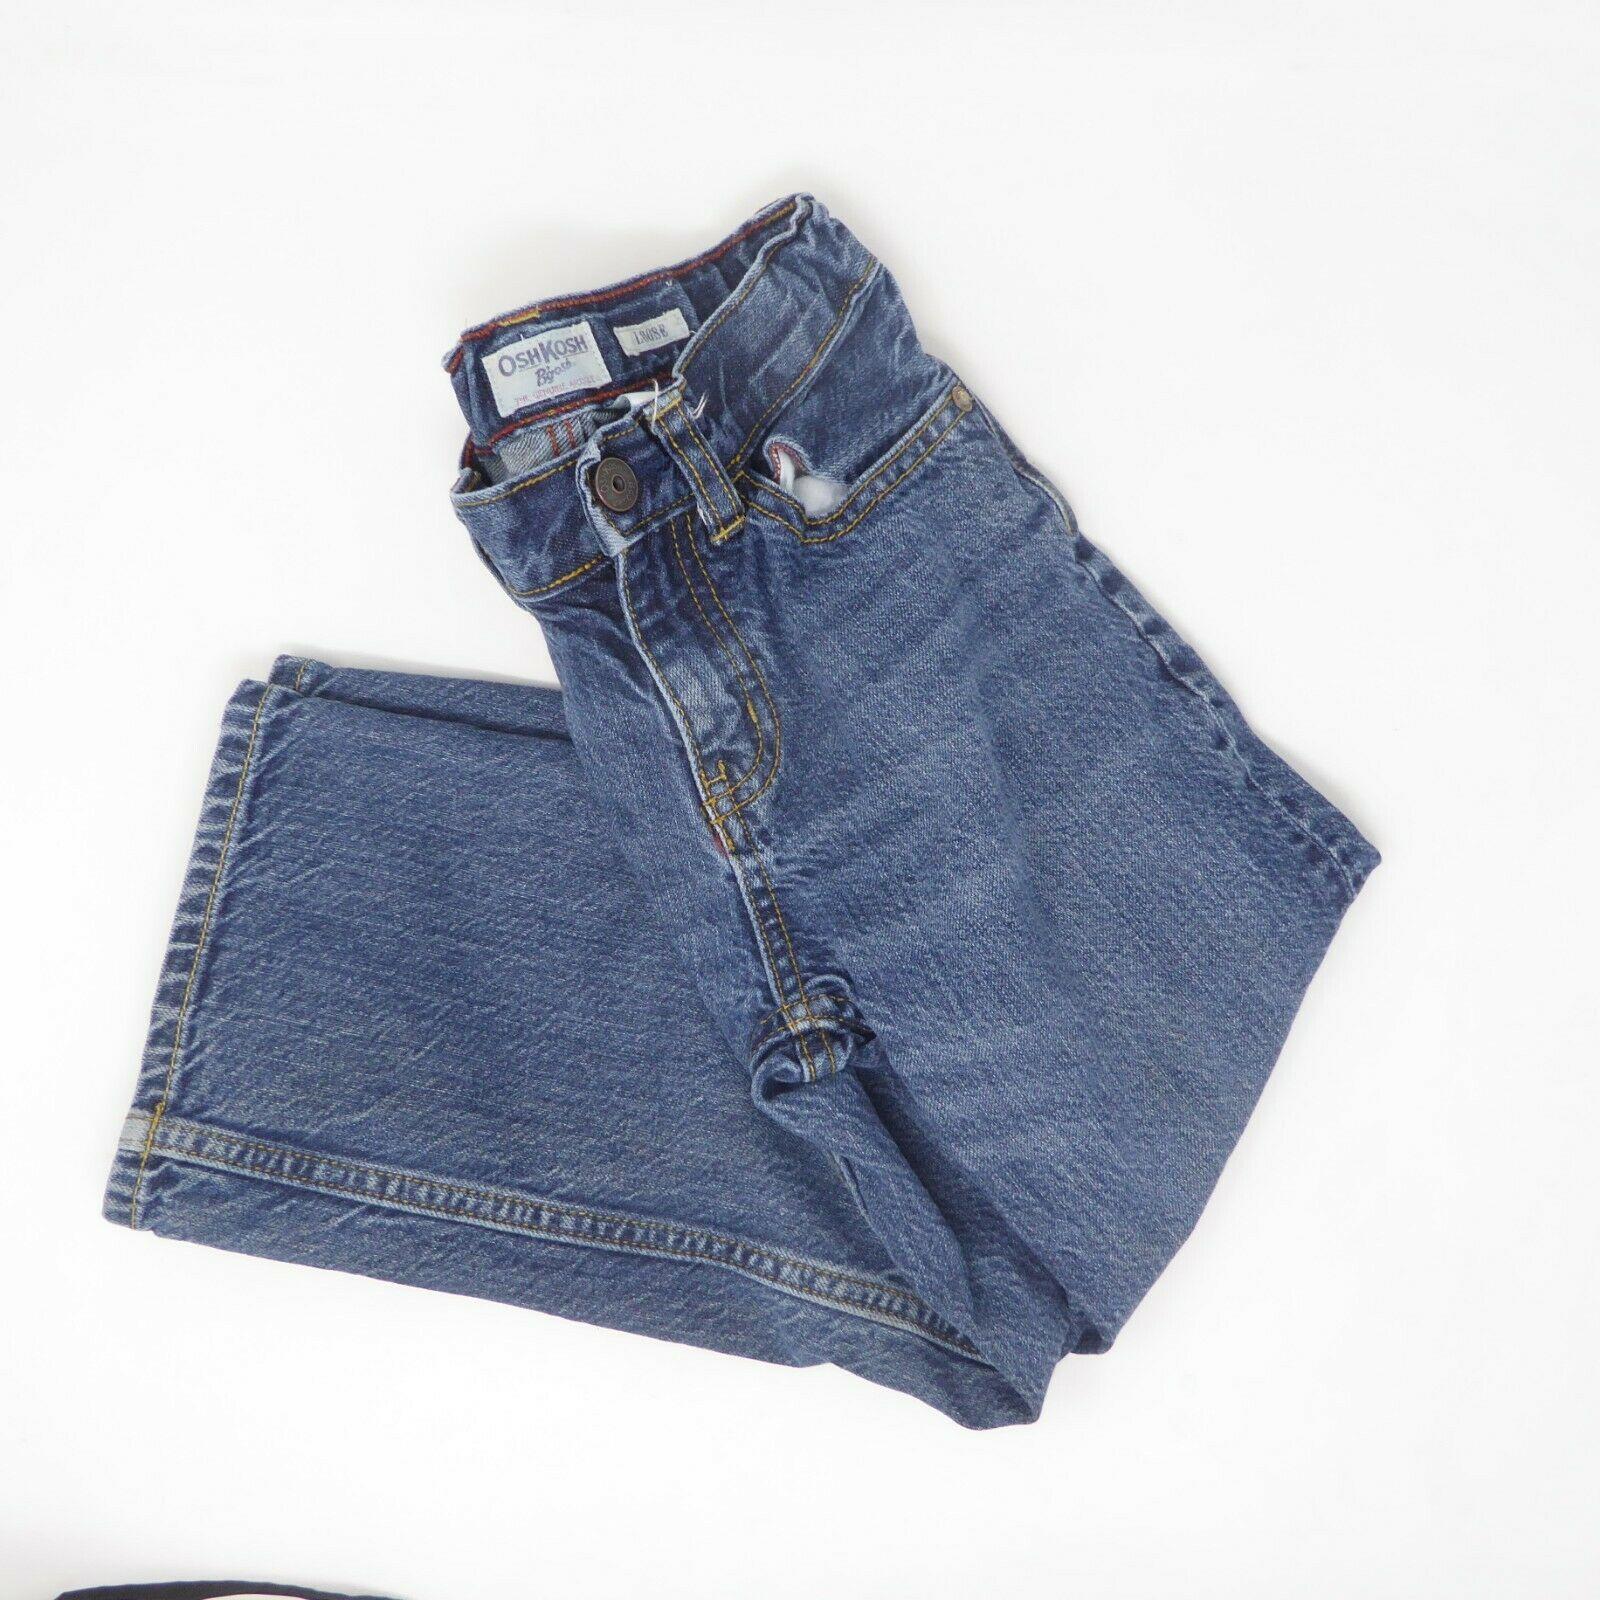 Oshkosh B'gosh Youth Boys Adjustable Waist Loose Fit Straight Leg Jeans Sz 6